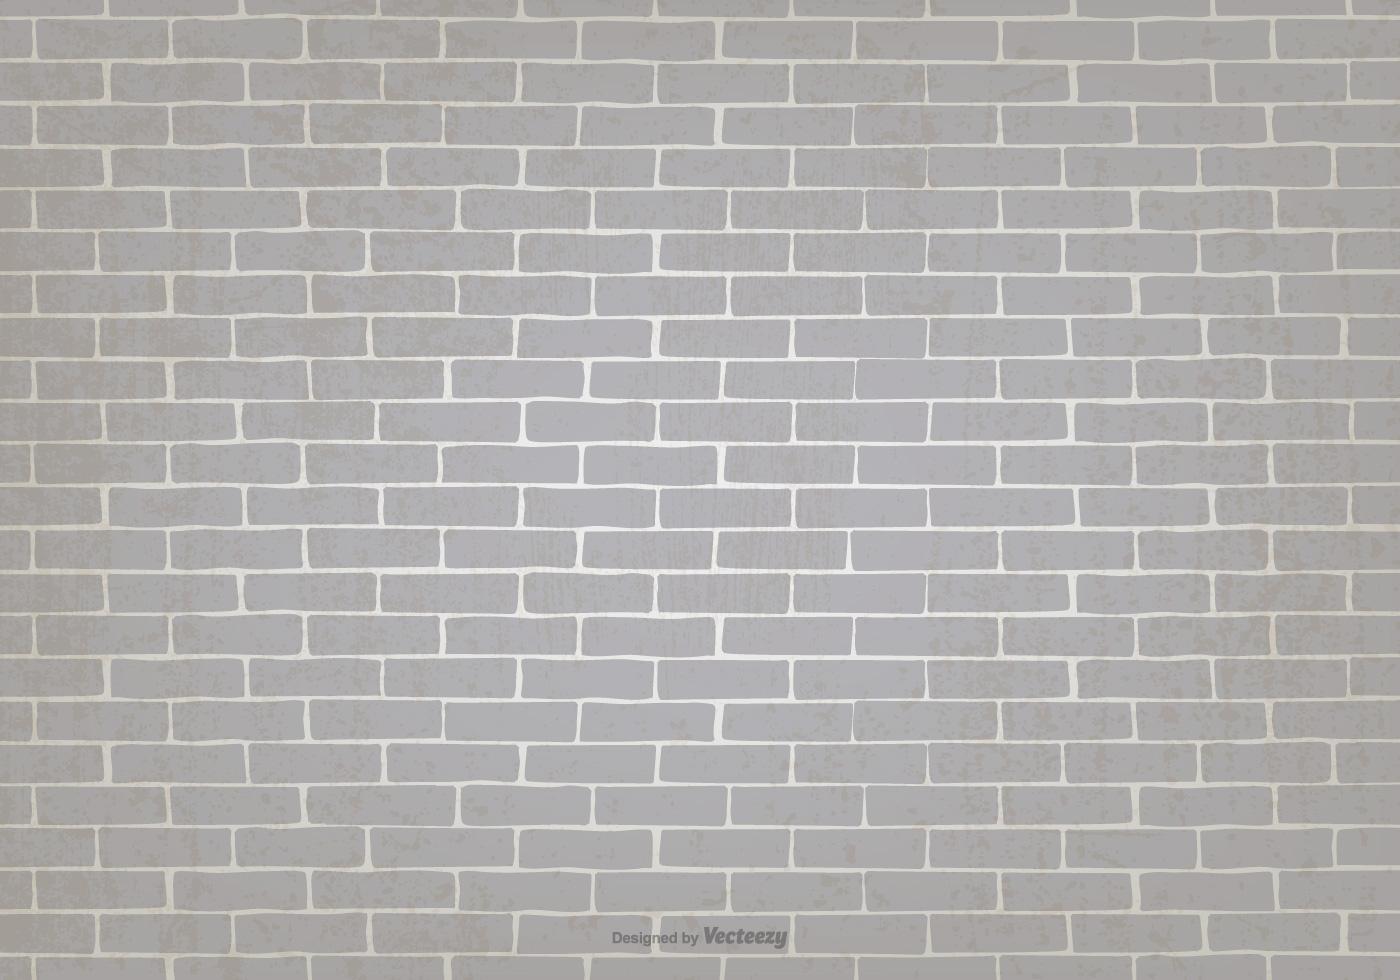 brick background 39 - photo #31